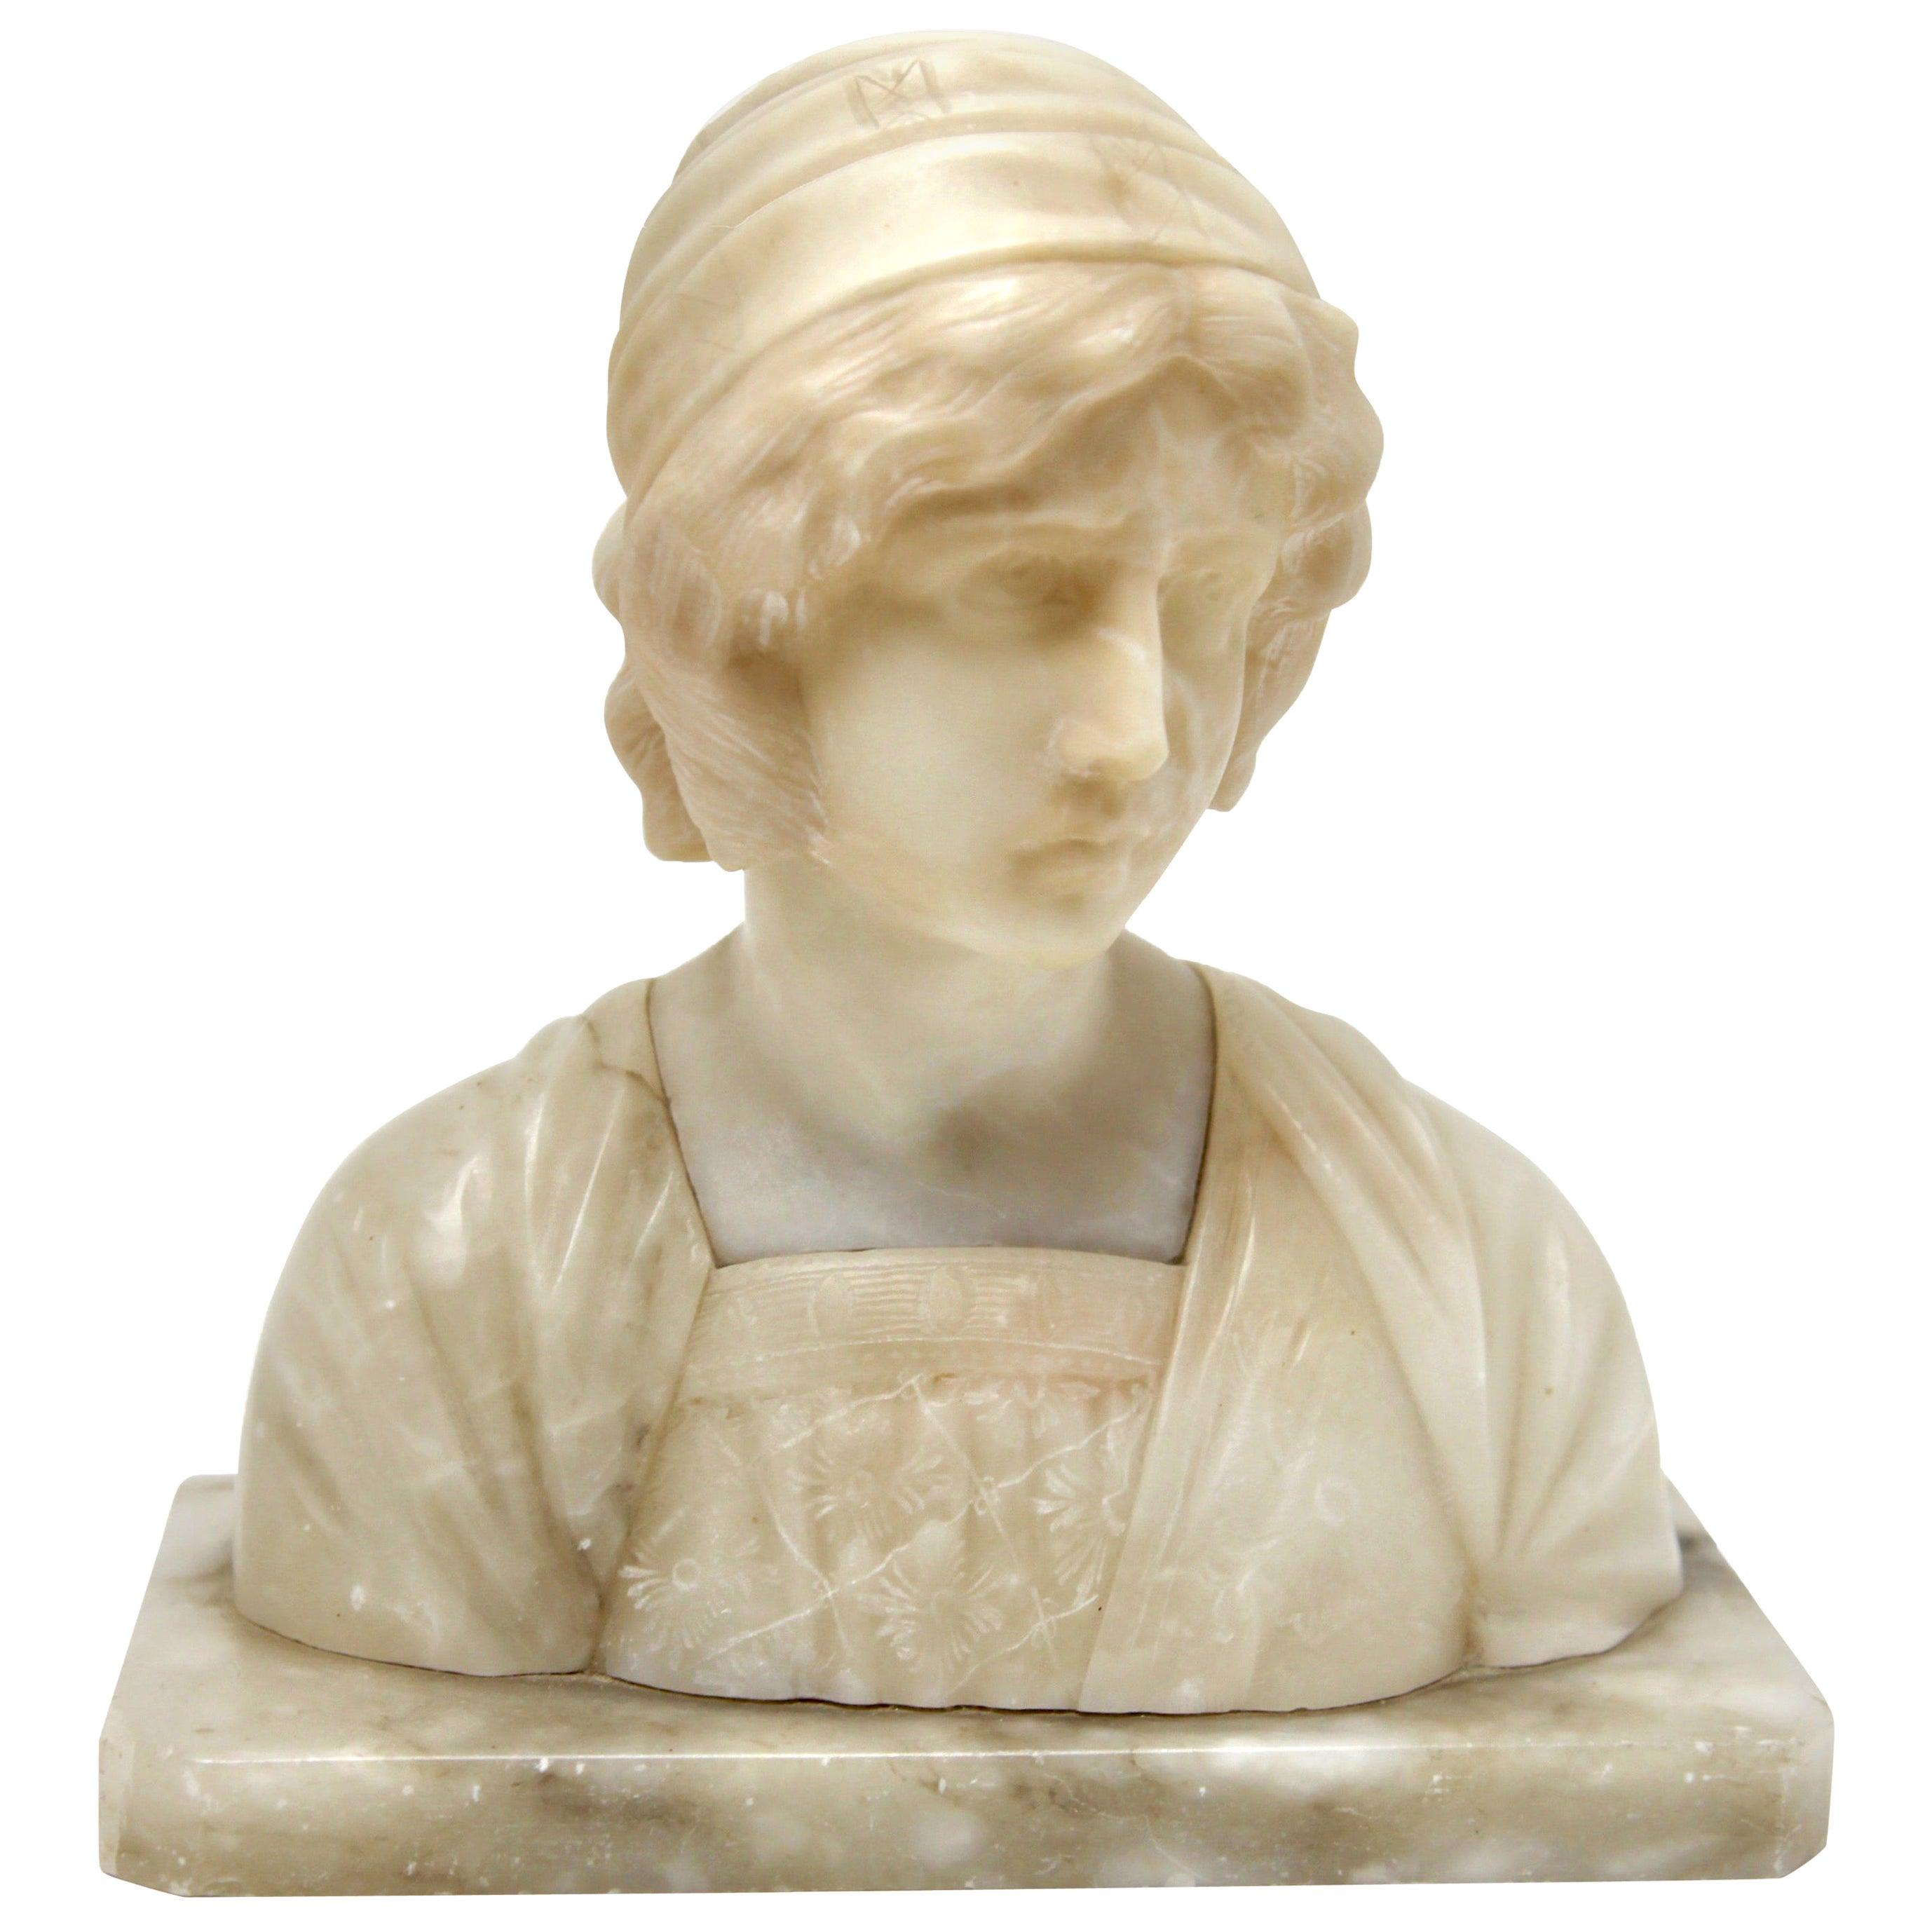 Art Nouveau Bust of a Young Woman Alabaster, Italy, circa 1930